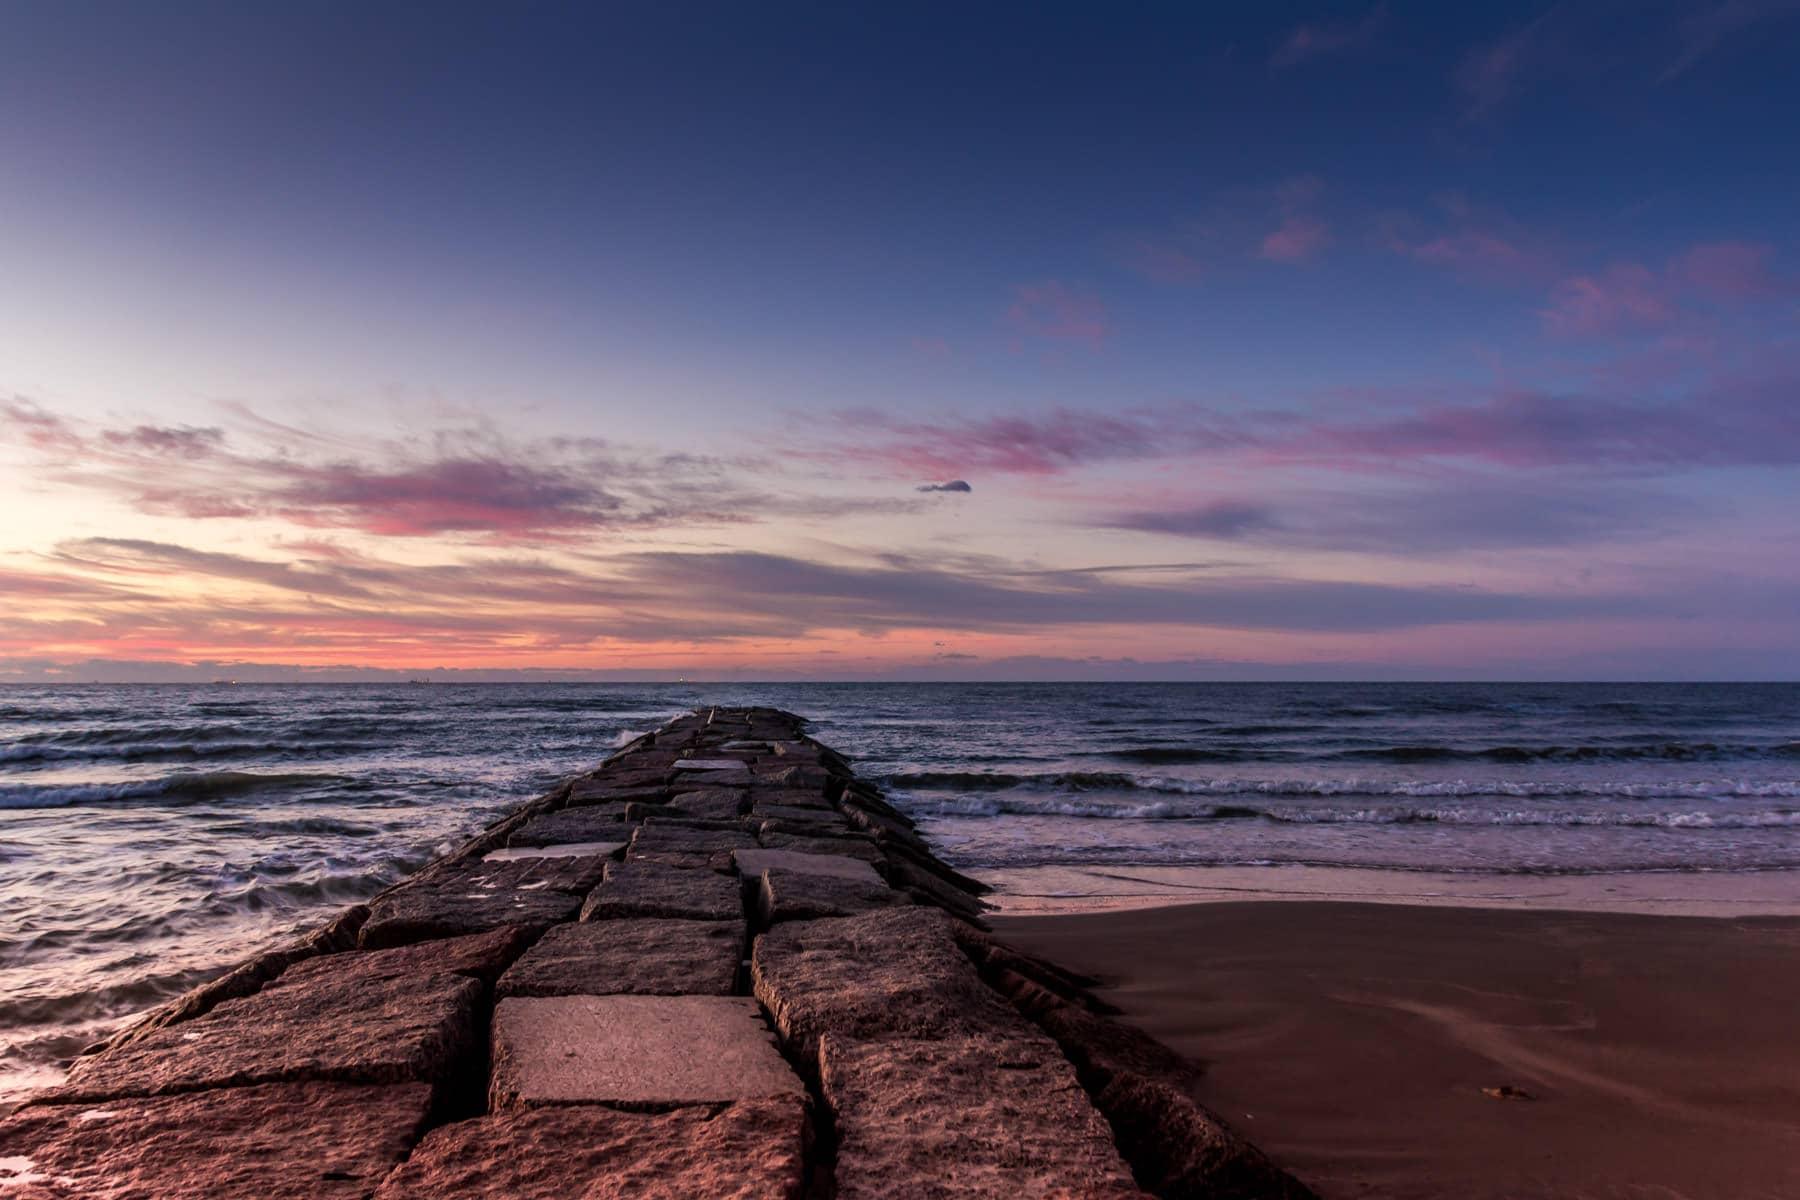 The sun rises over the Gulf of Mexico east of Galveston Island, Texas.